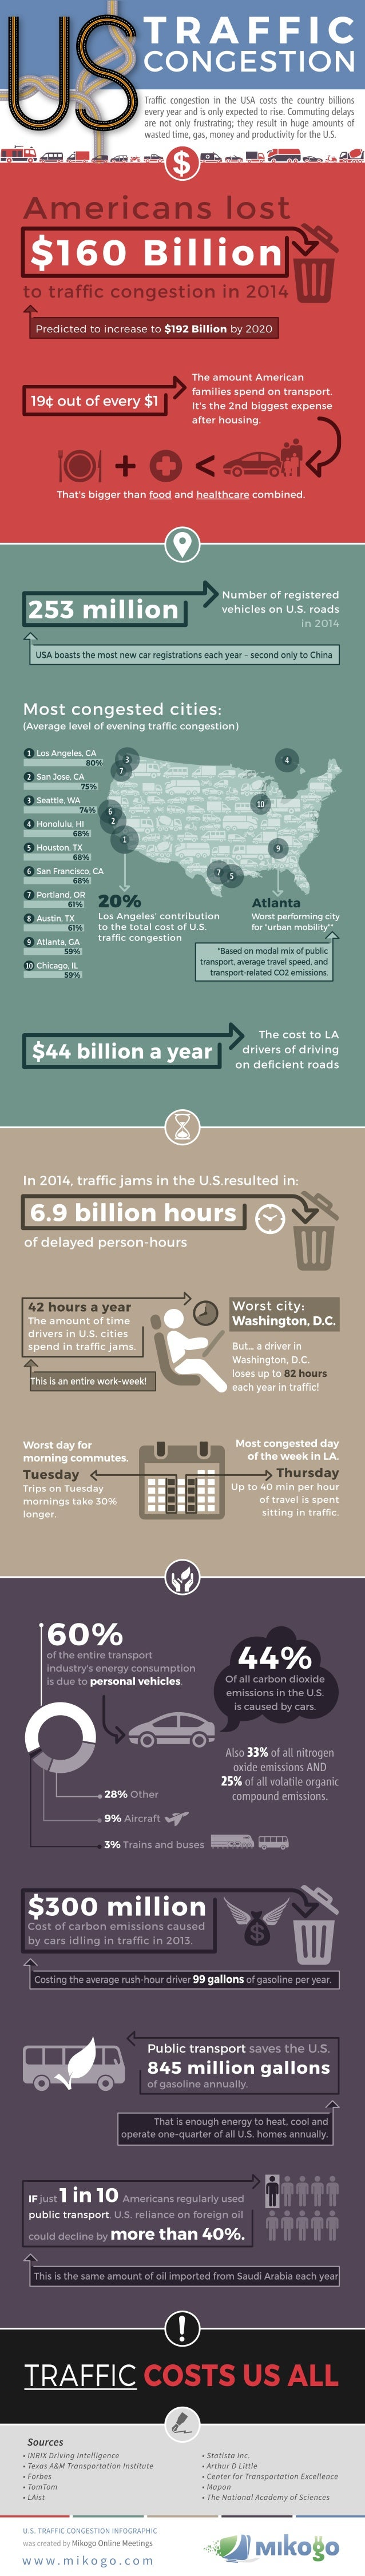 The Annual Cost of U.S. Traffic Congestion – $160 Billion